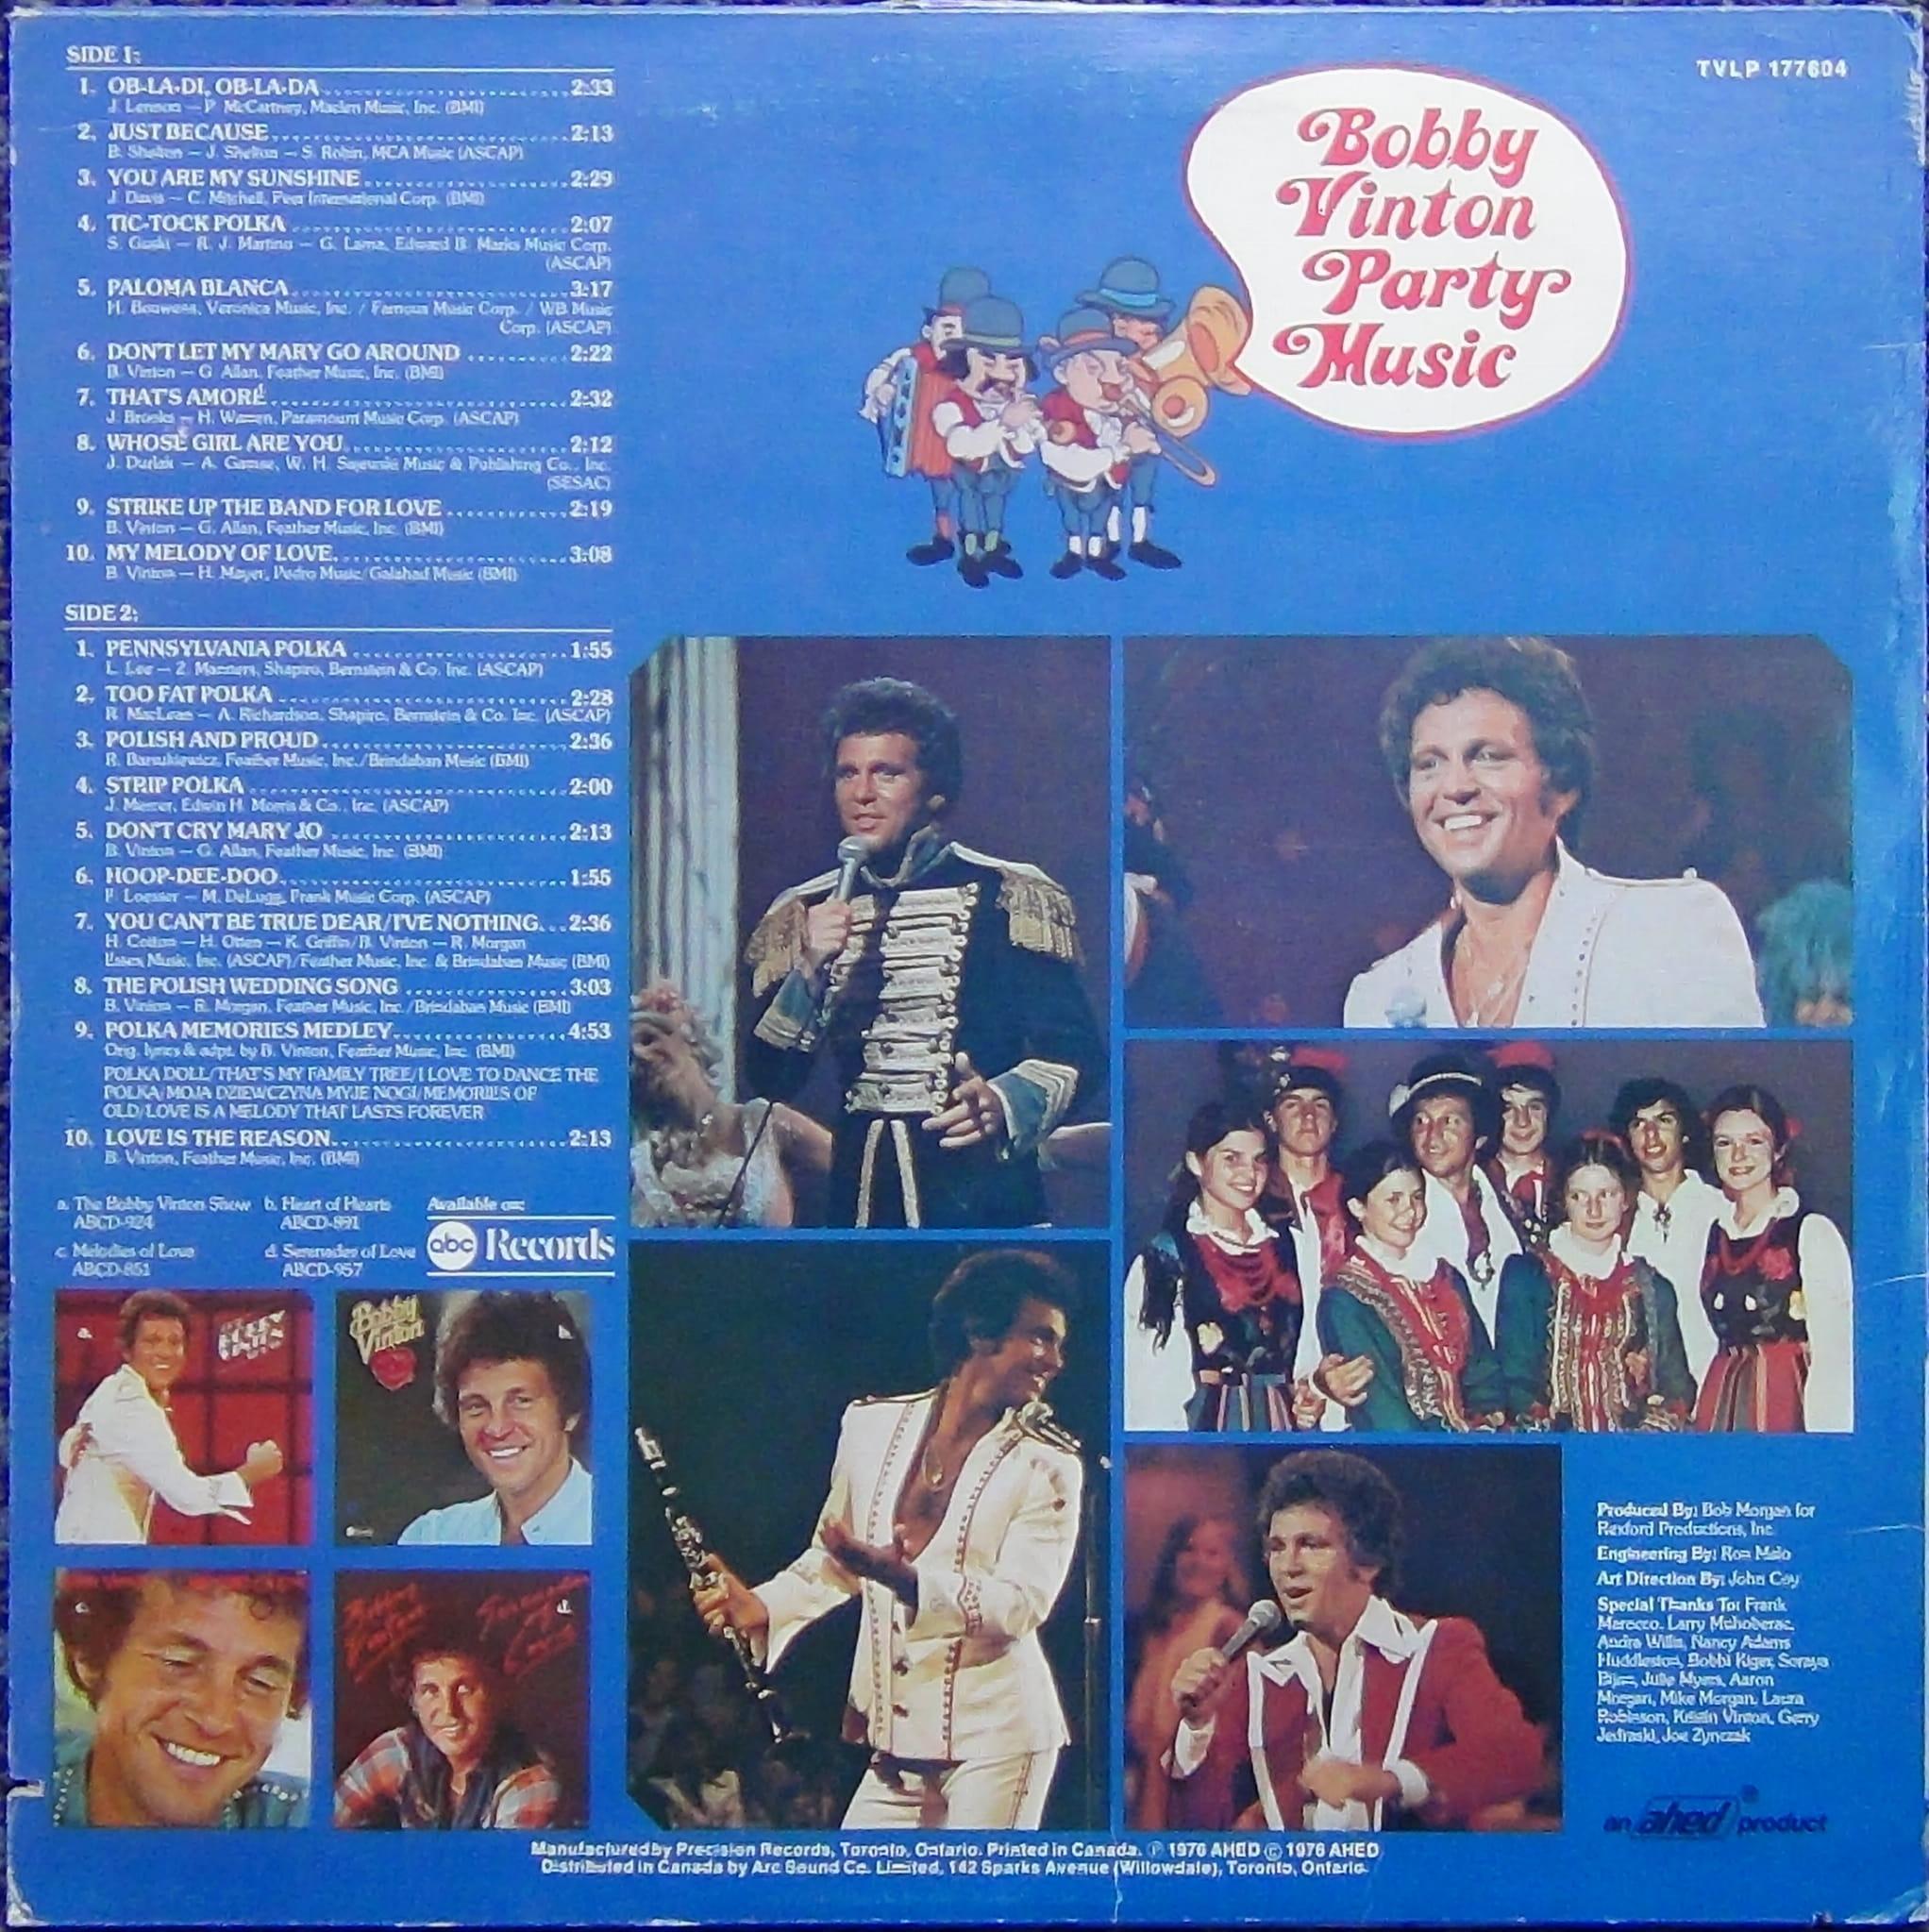 Bobby Vinton Party Music Tvlp 177604 Vinyl